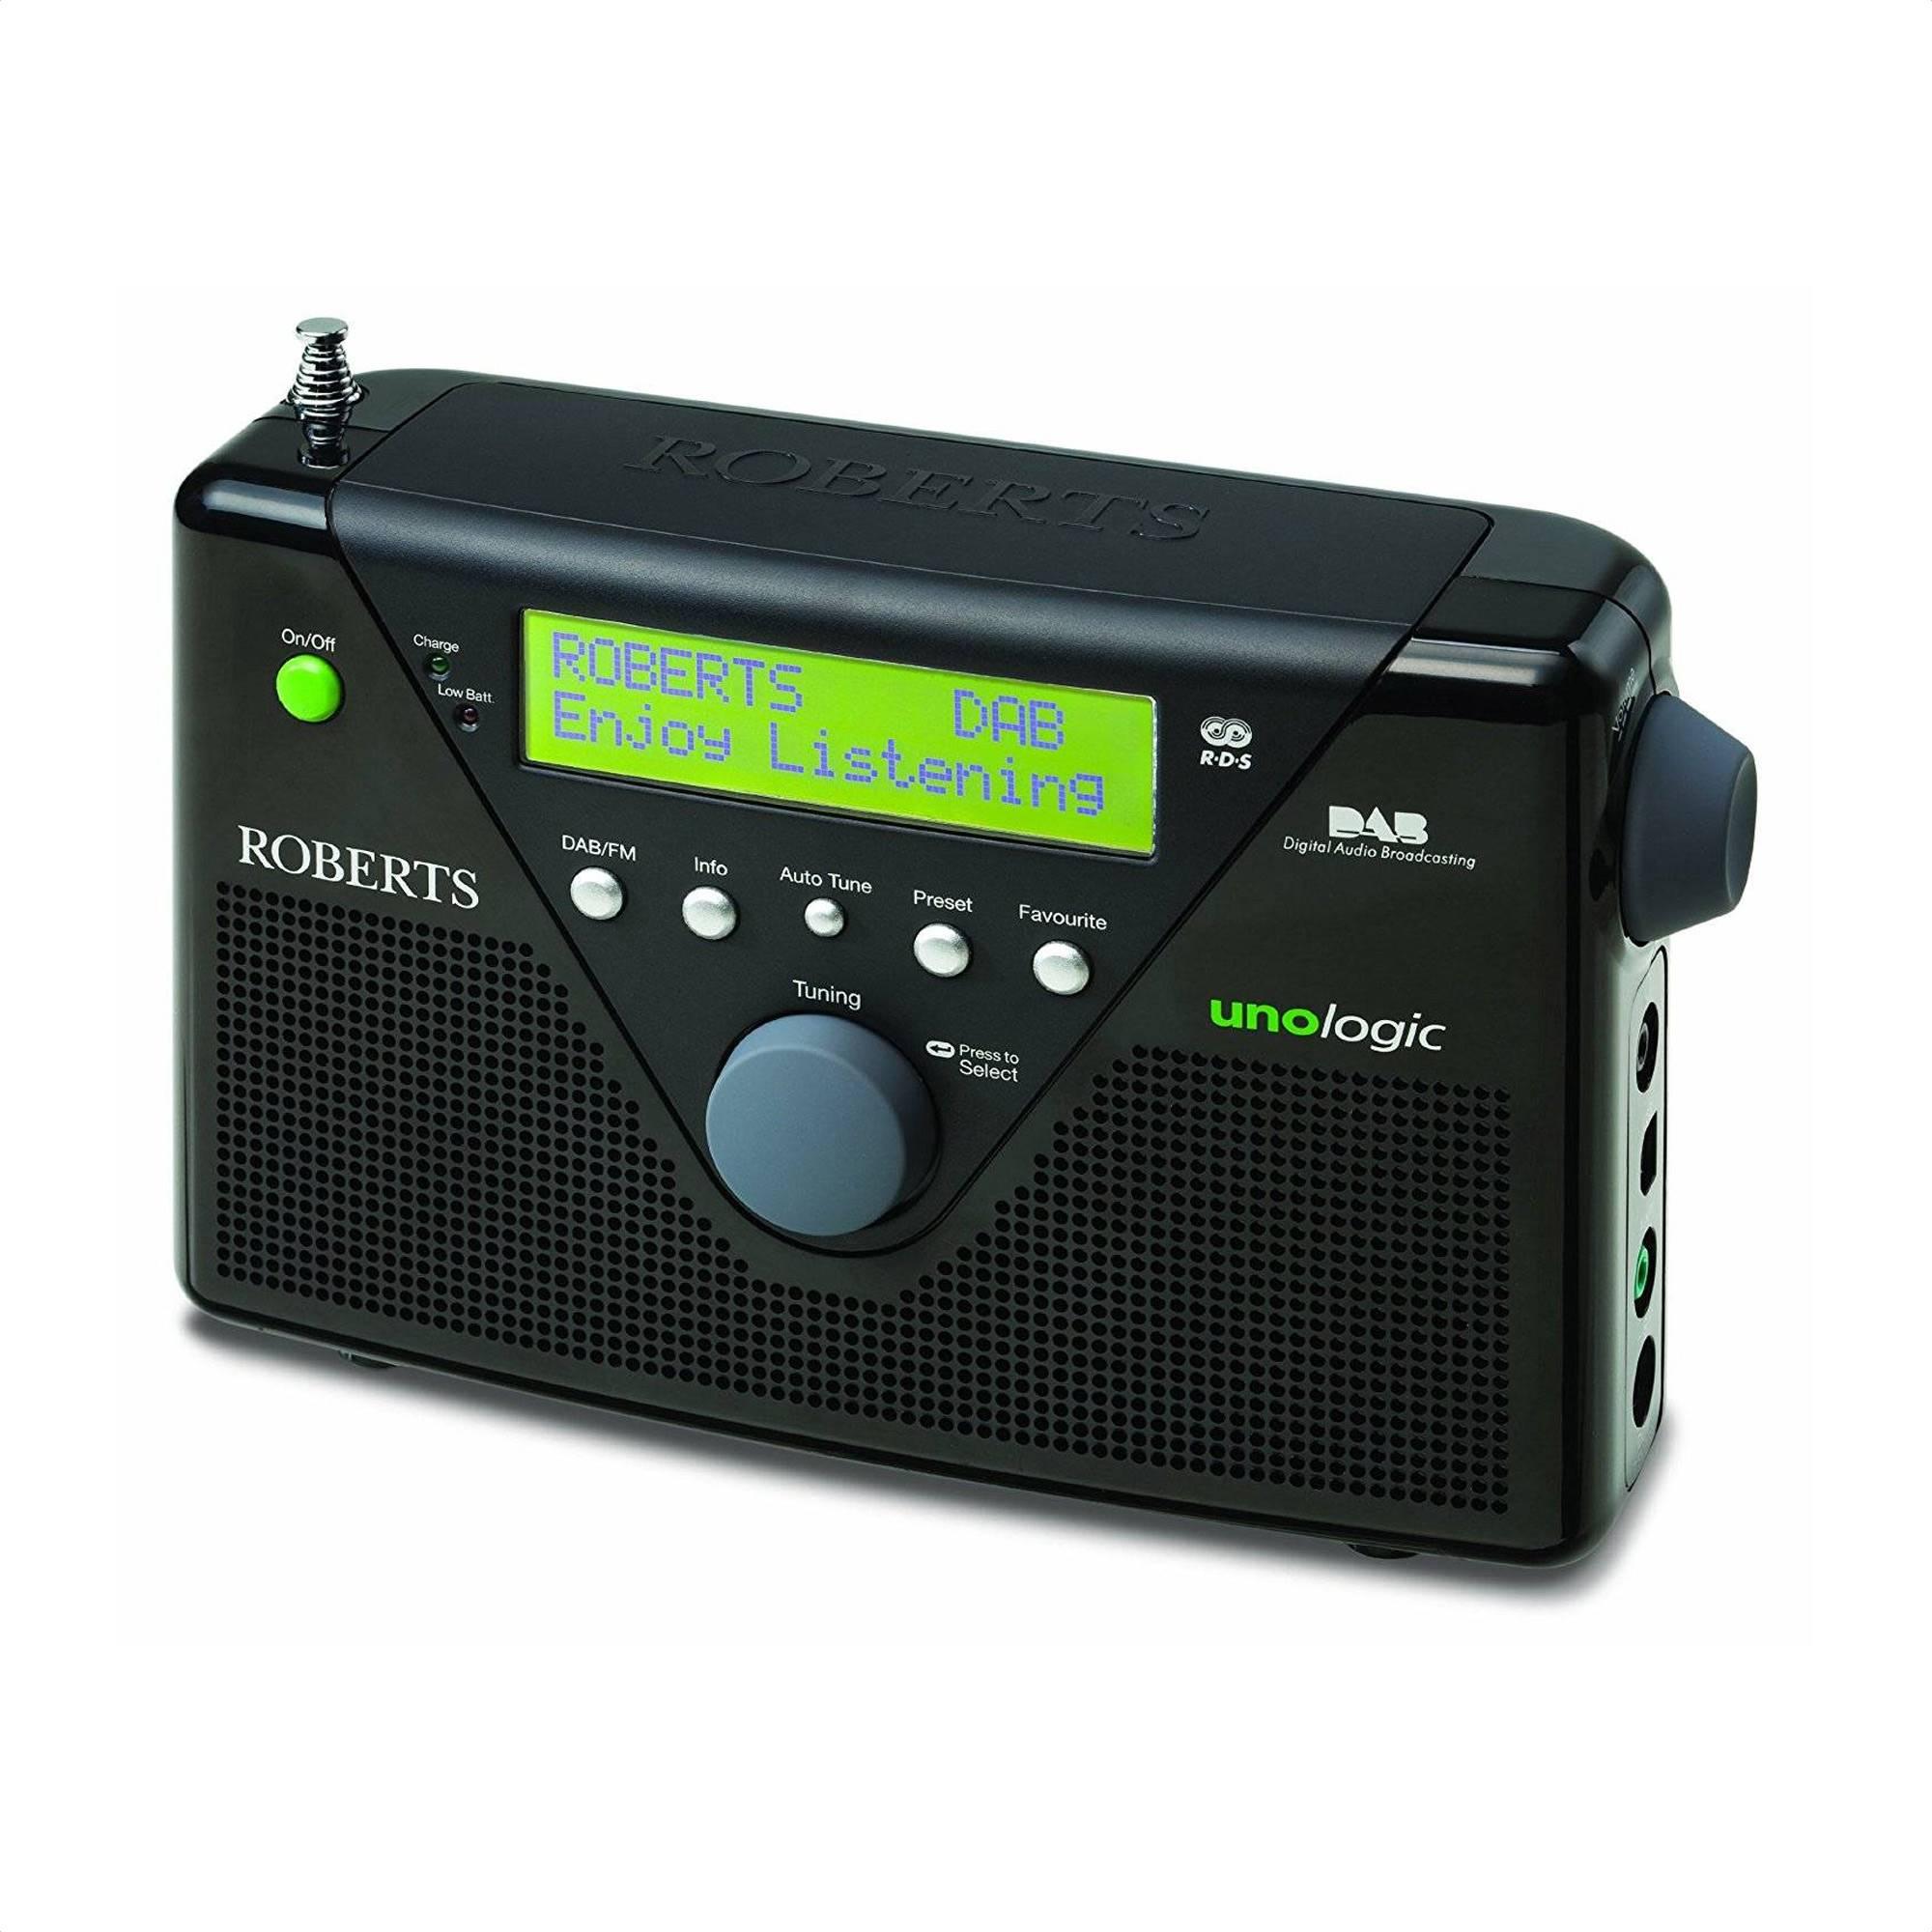 Roberts Unologic Dab Fm Portable Radio Oldrids Down Loading Zoom